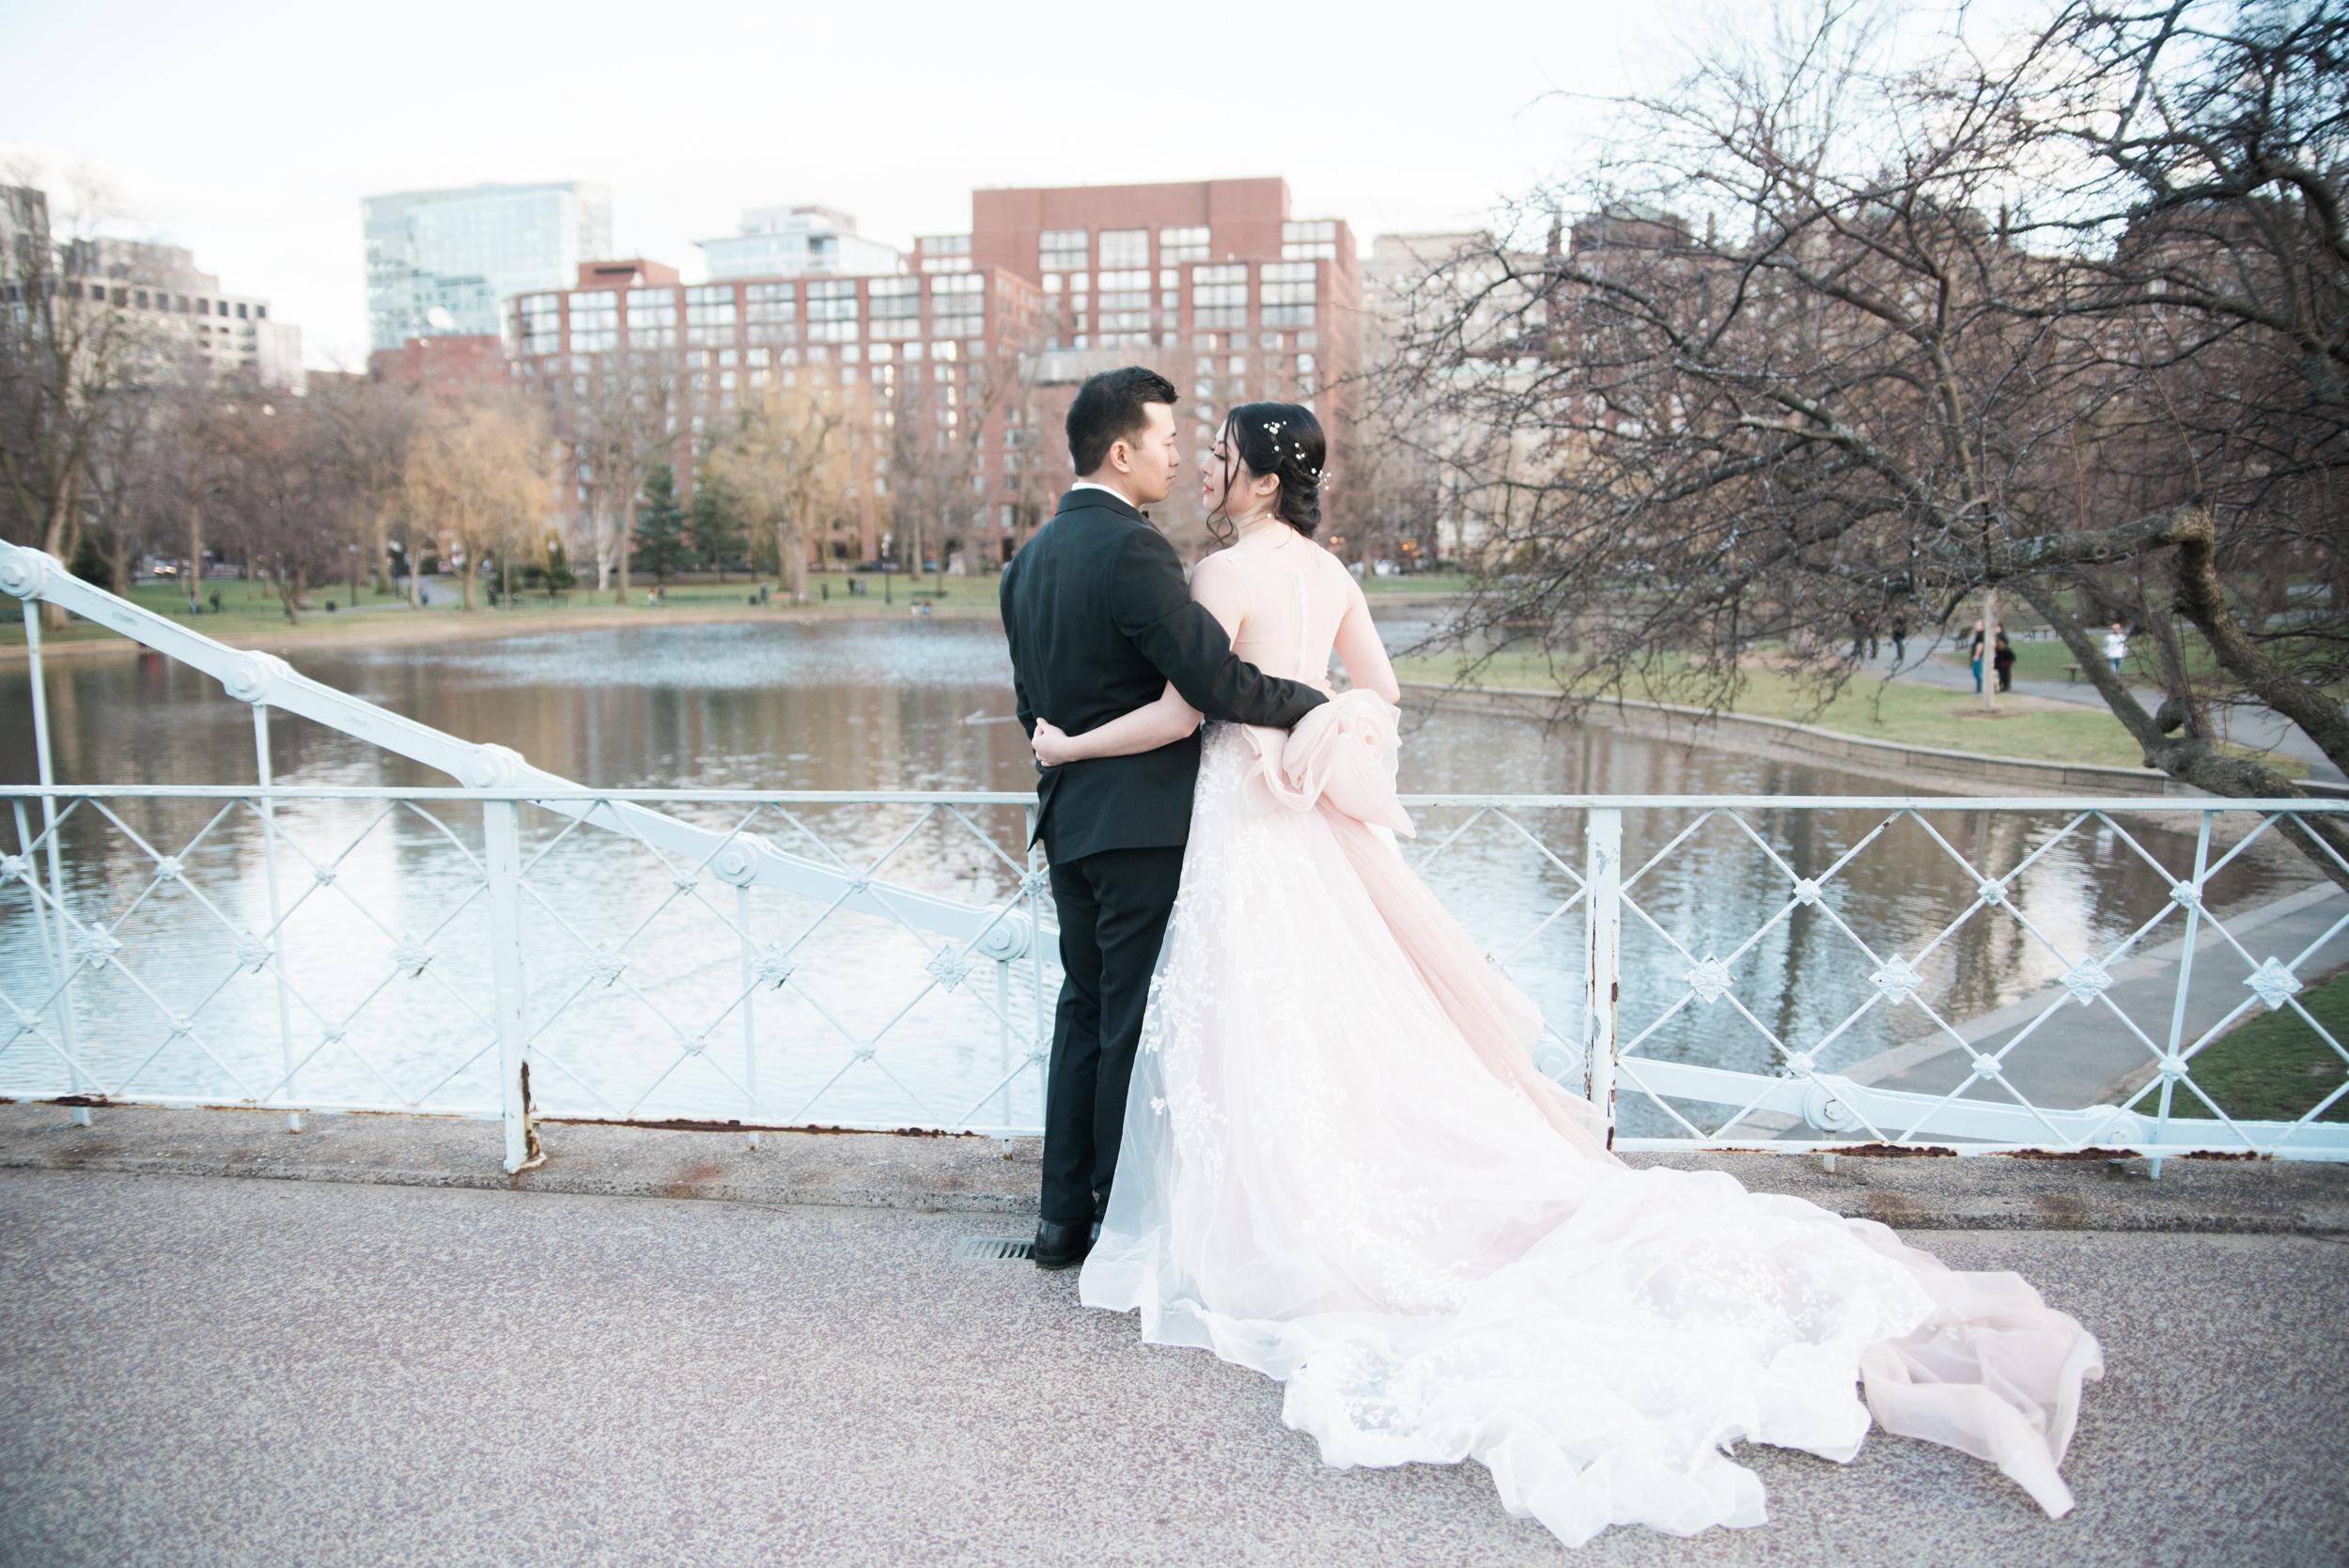 Wedding Photograpehrs near Cape Cod